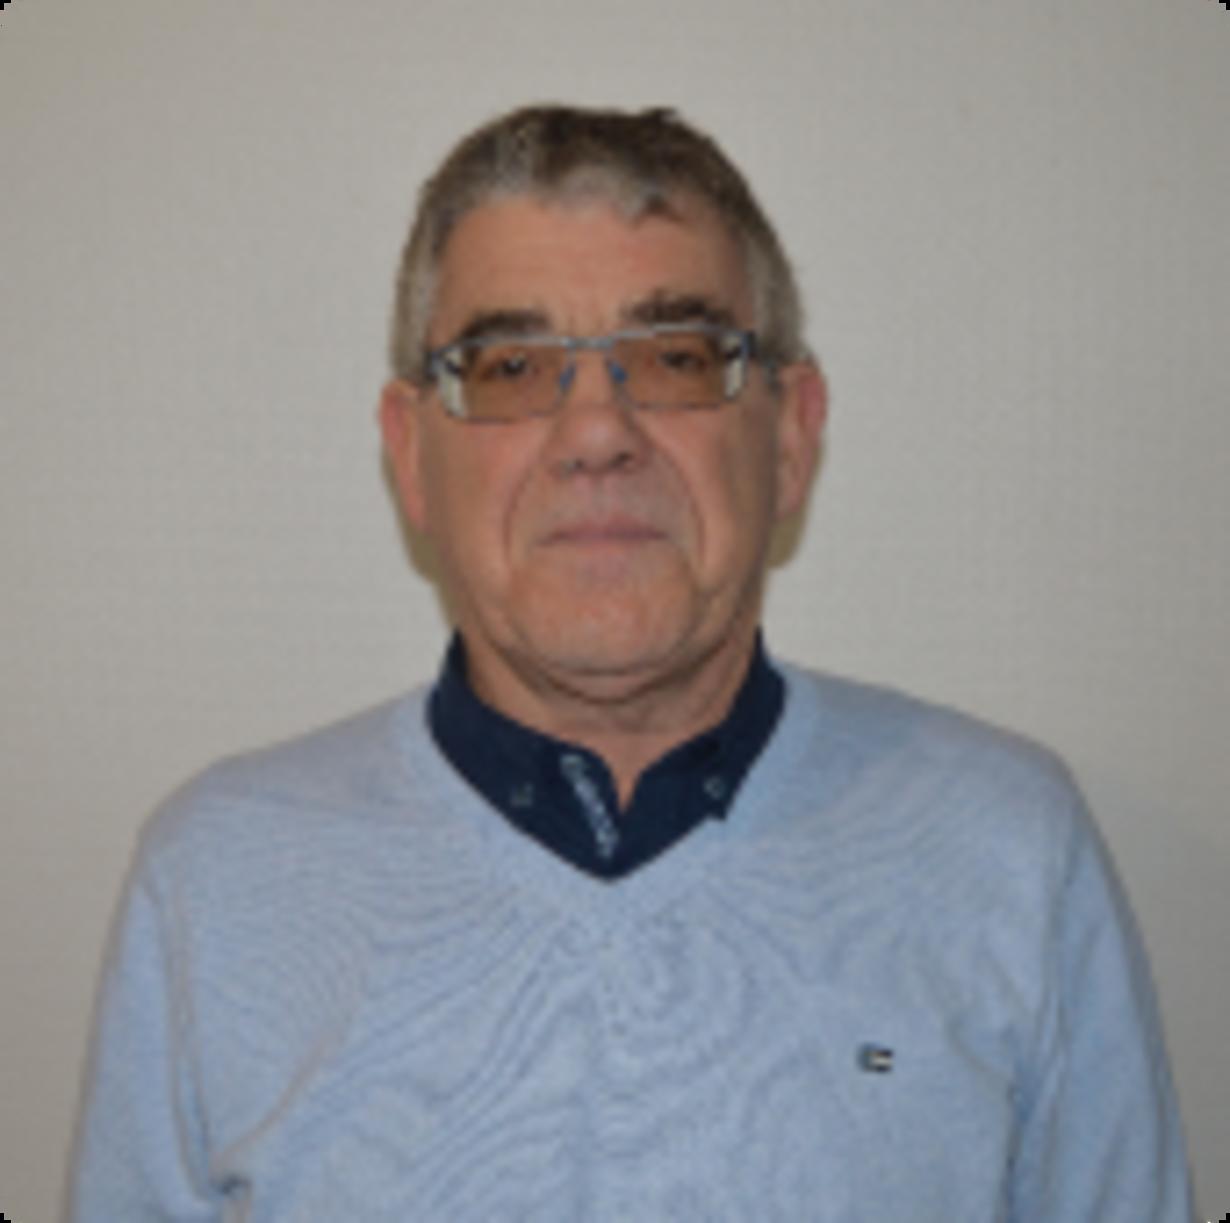 jean-pierre - le goff 2eme maire-adjoint